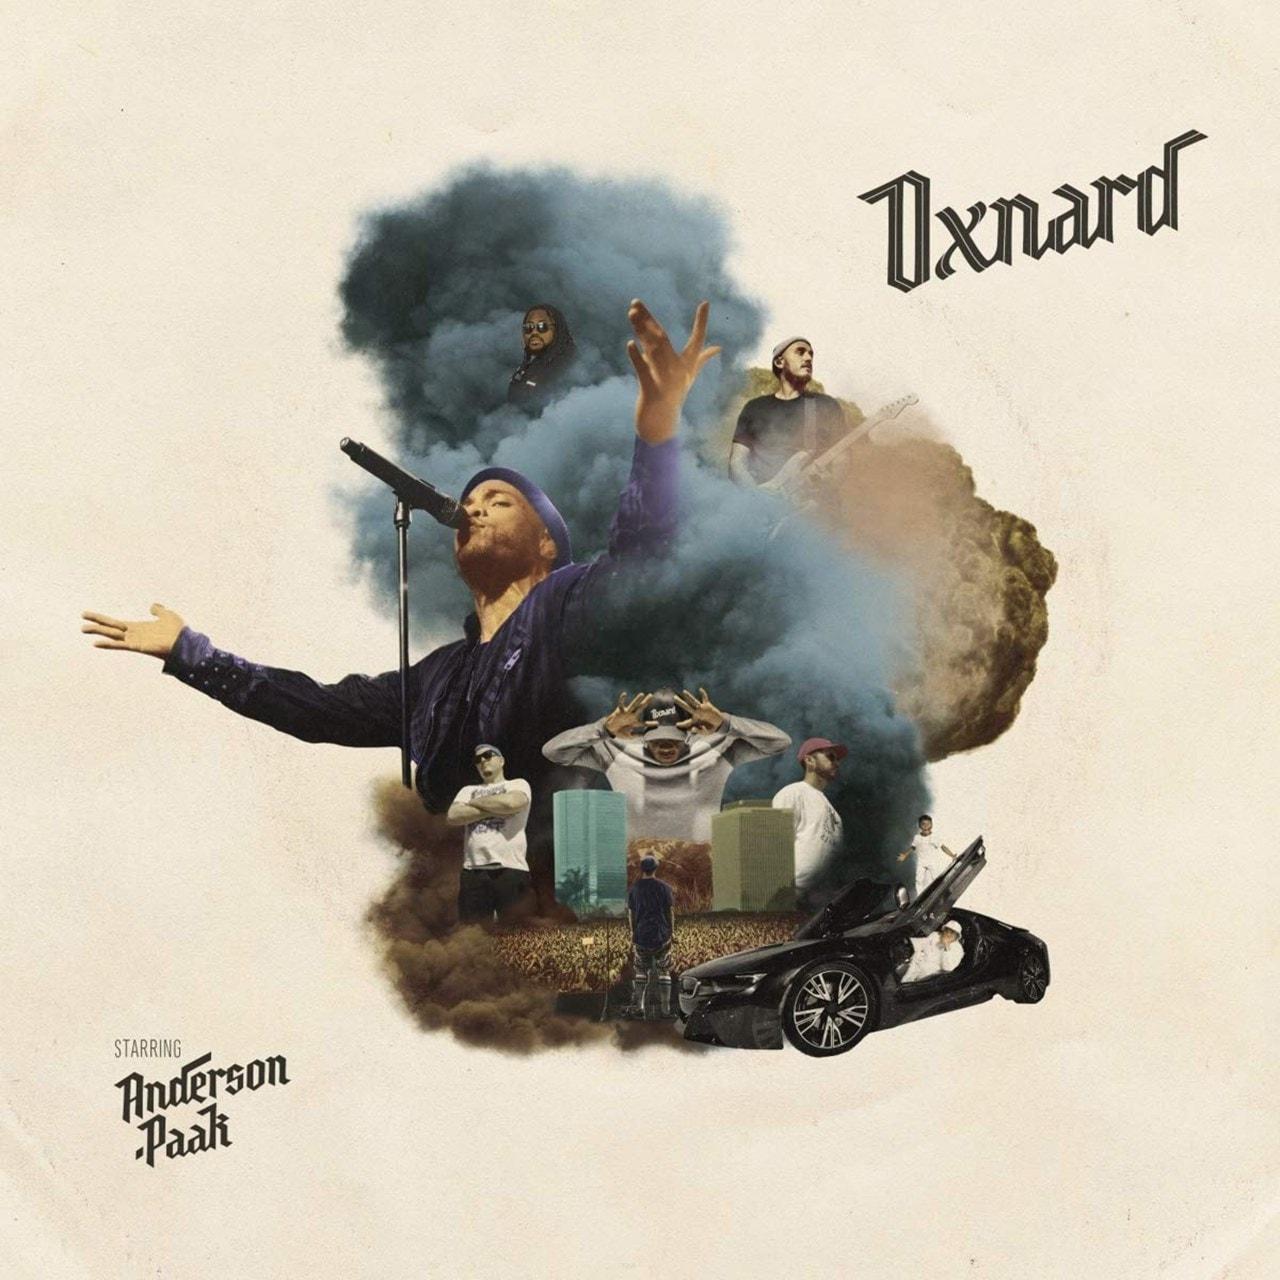 Oxnard - 1